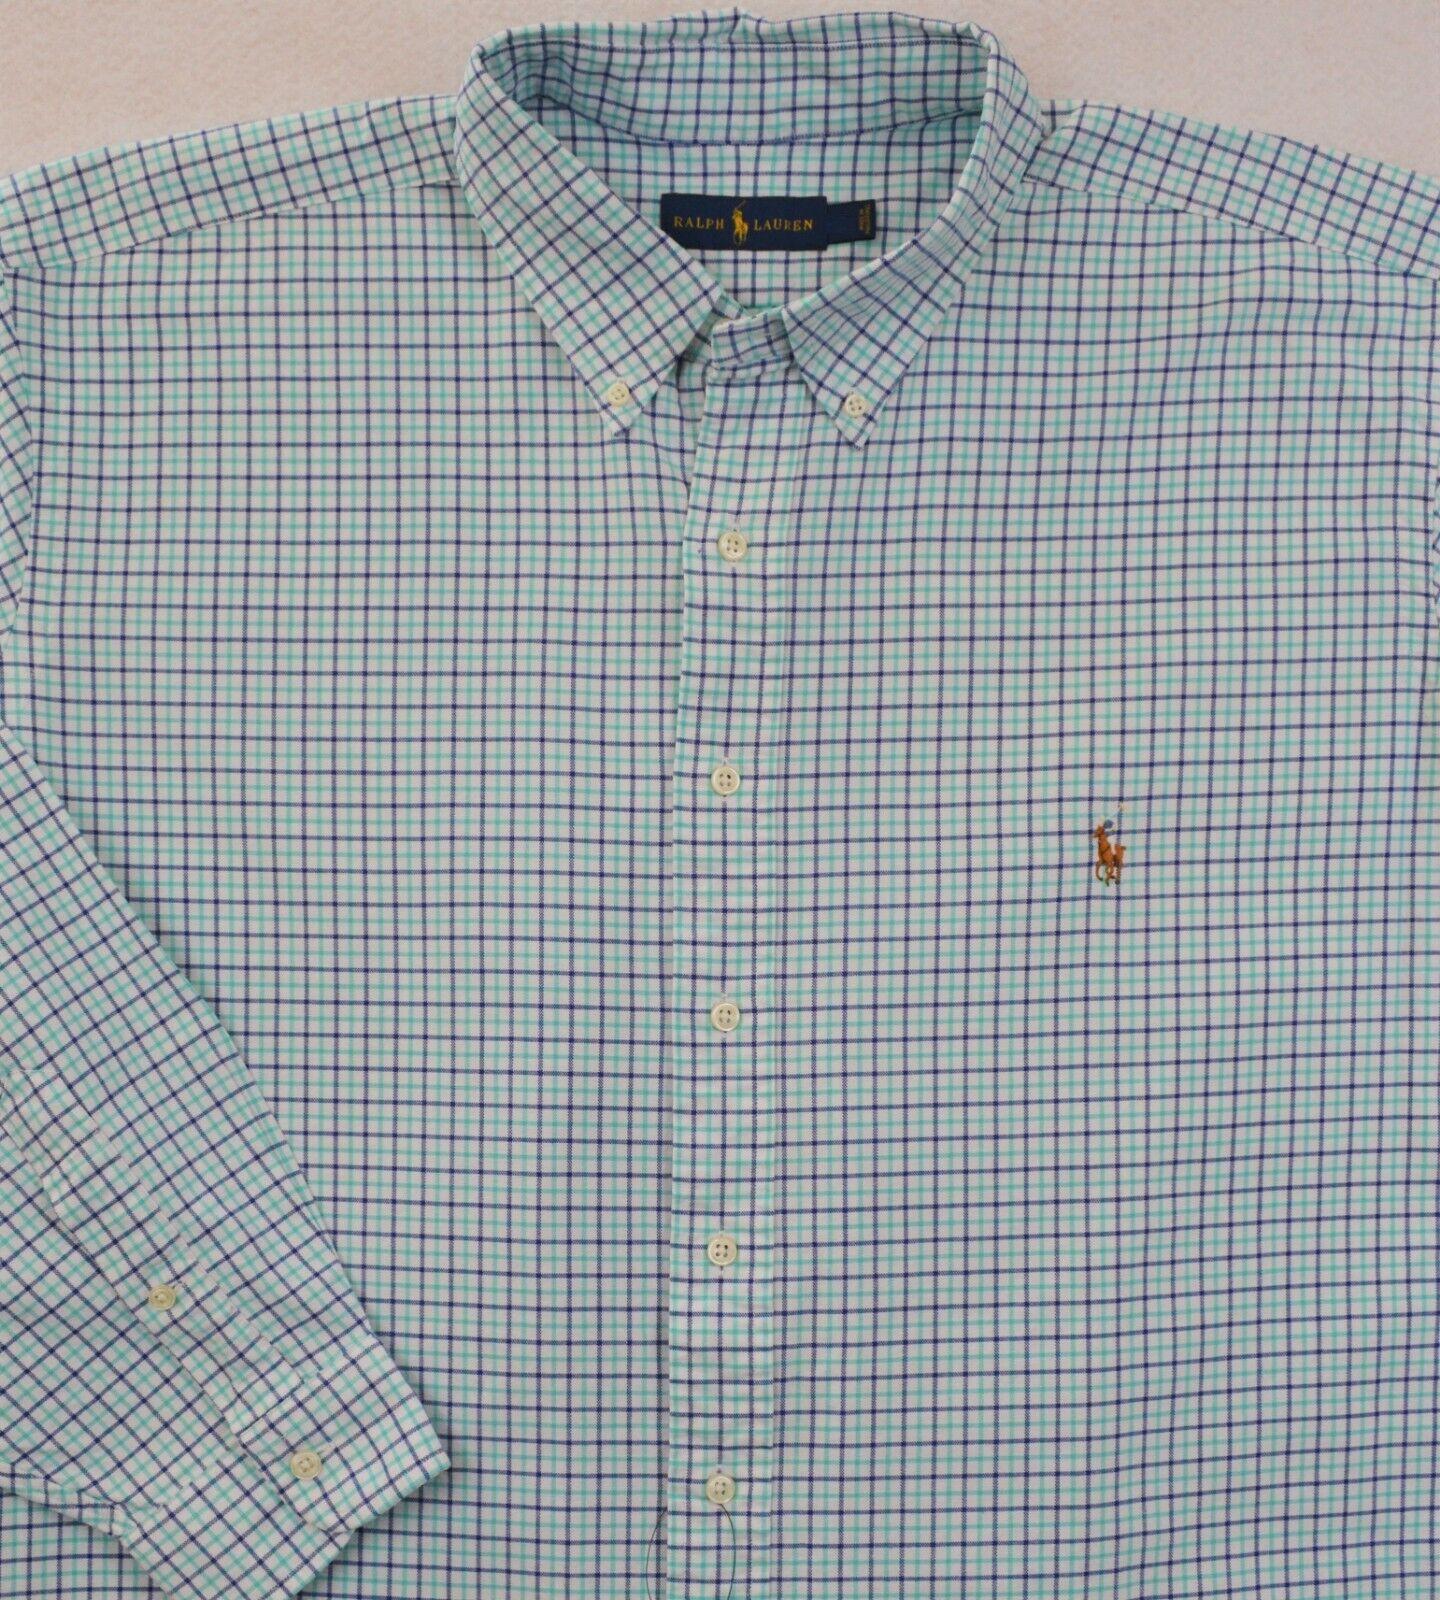 Ralph Lauren Shirt Oxford bluee Plaid Long Sleeves 2XB & 2XLT NWT